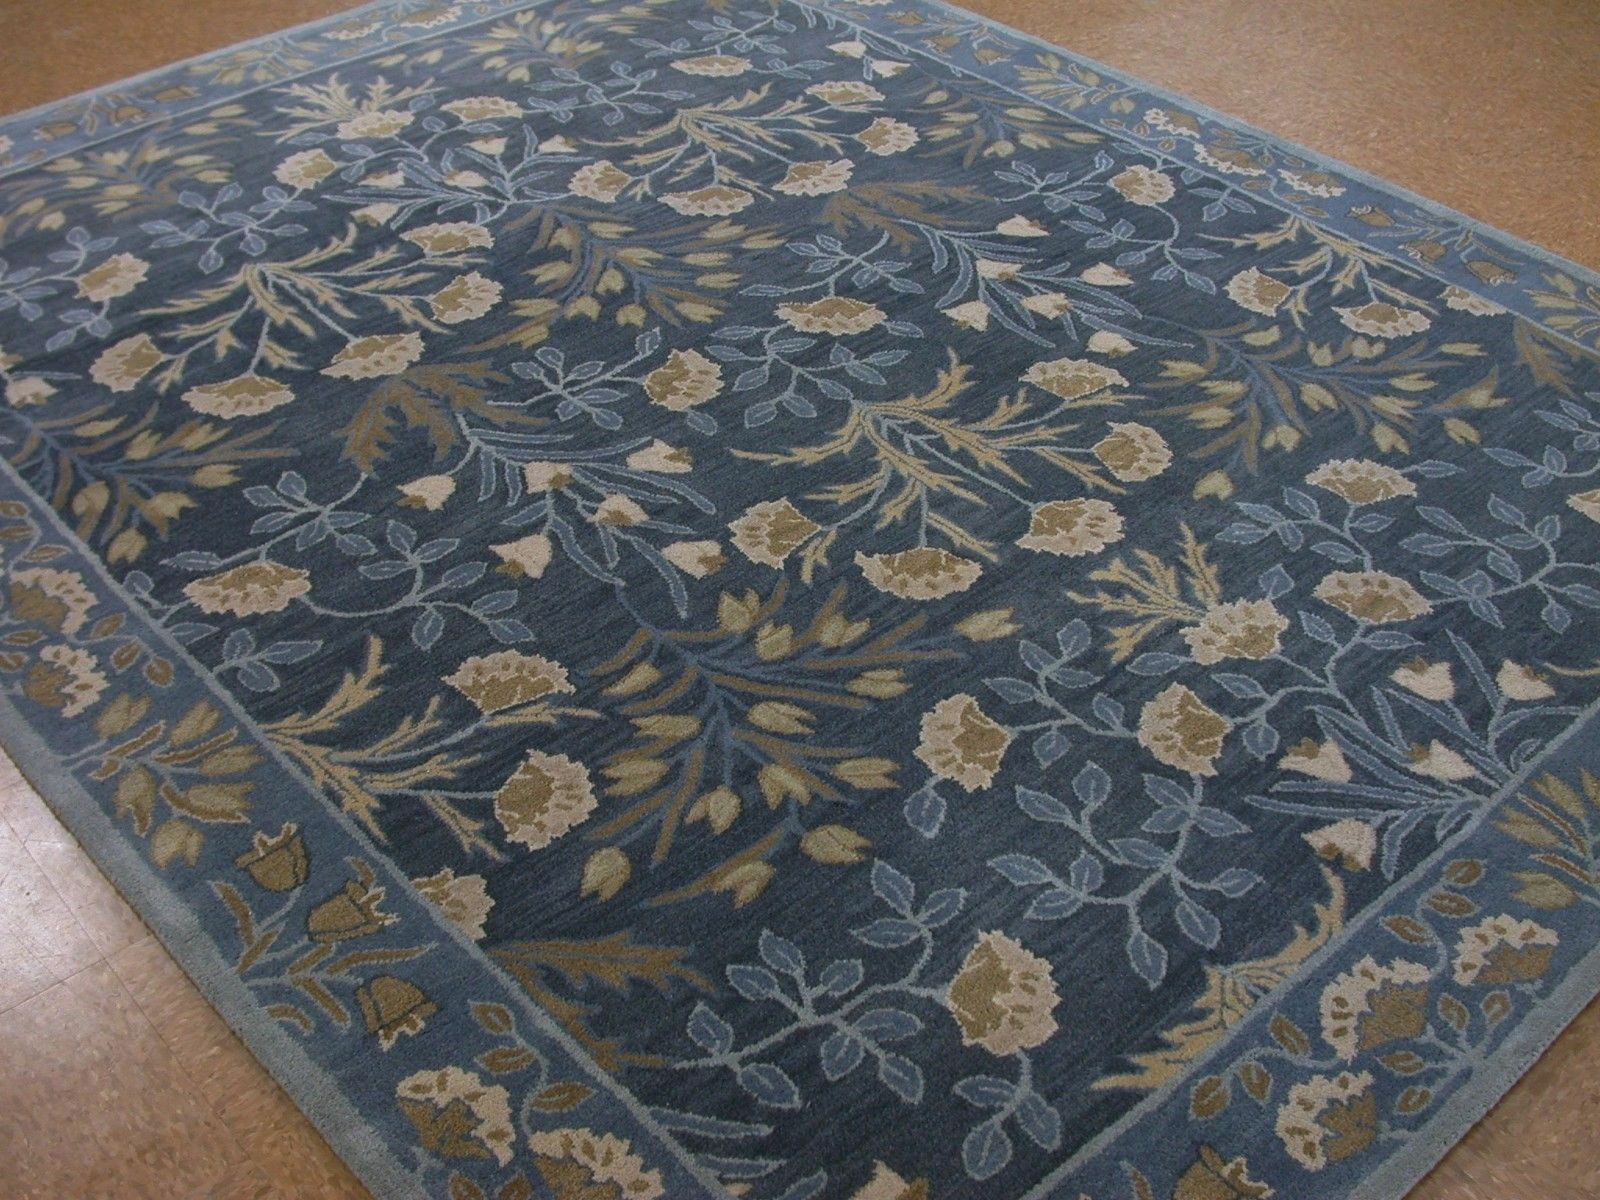 Authentic 2.5x9 3x5 5X8 8X10 9X12 Botanical Floral Blue wool